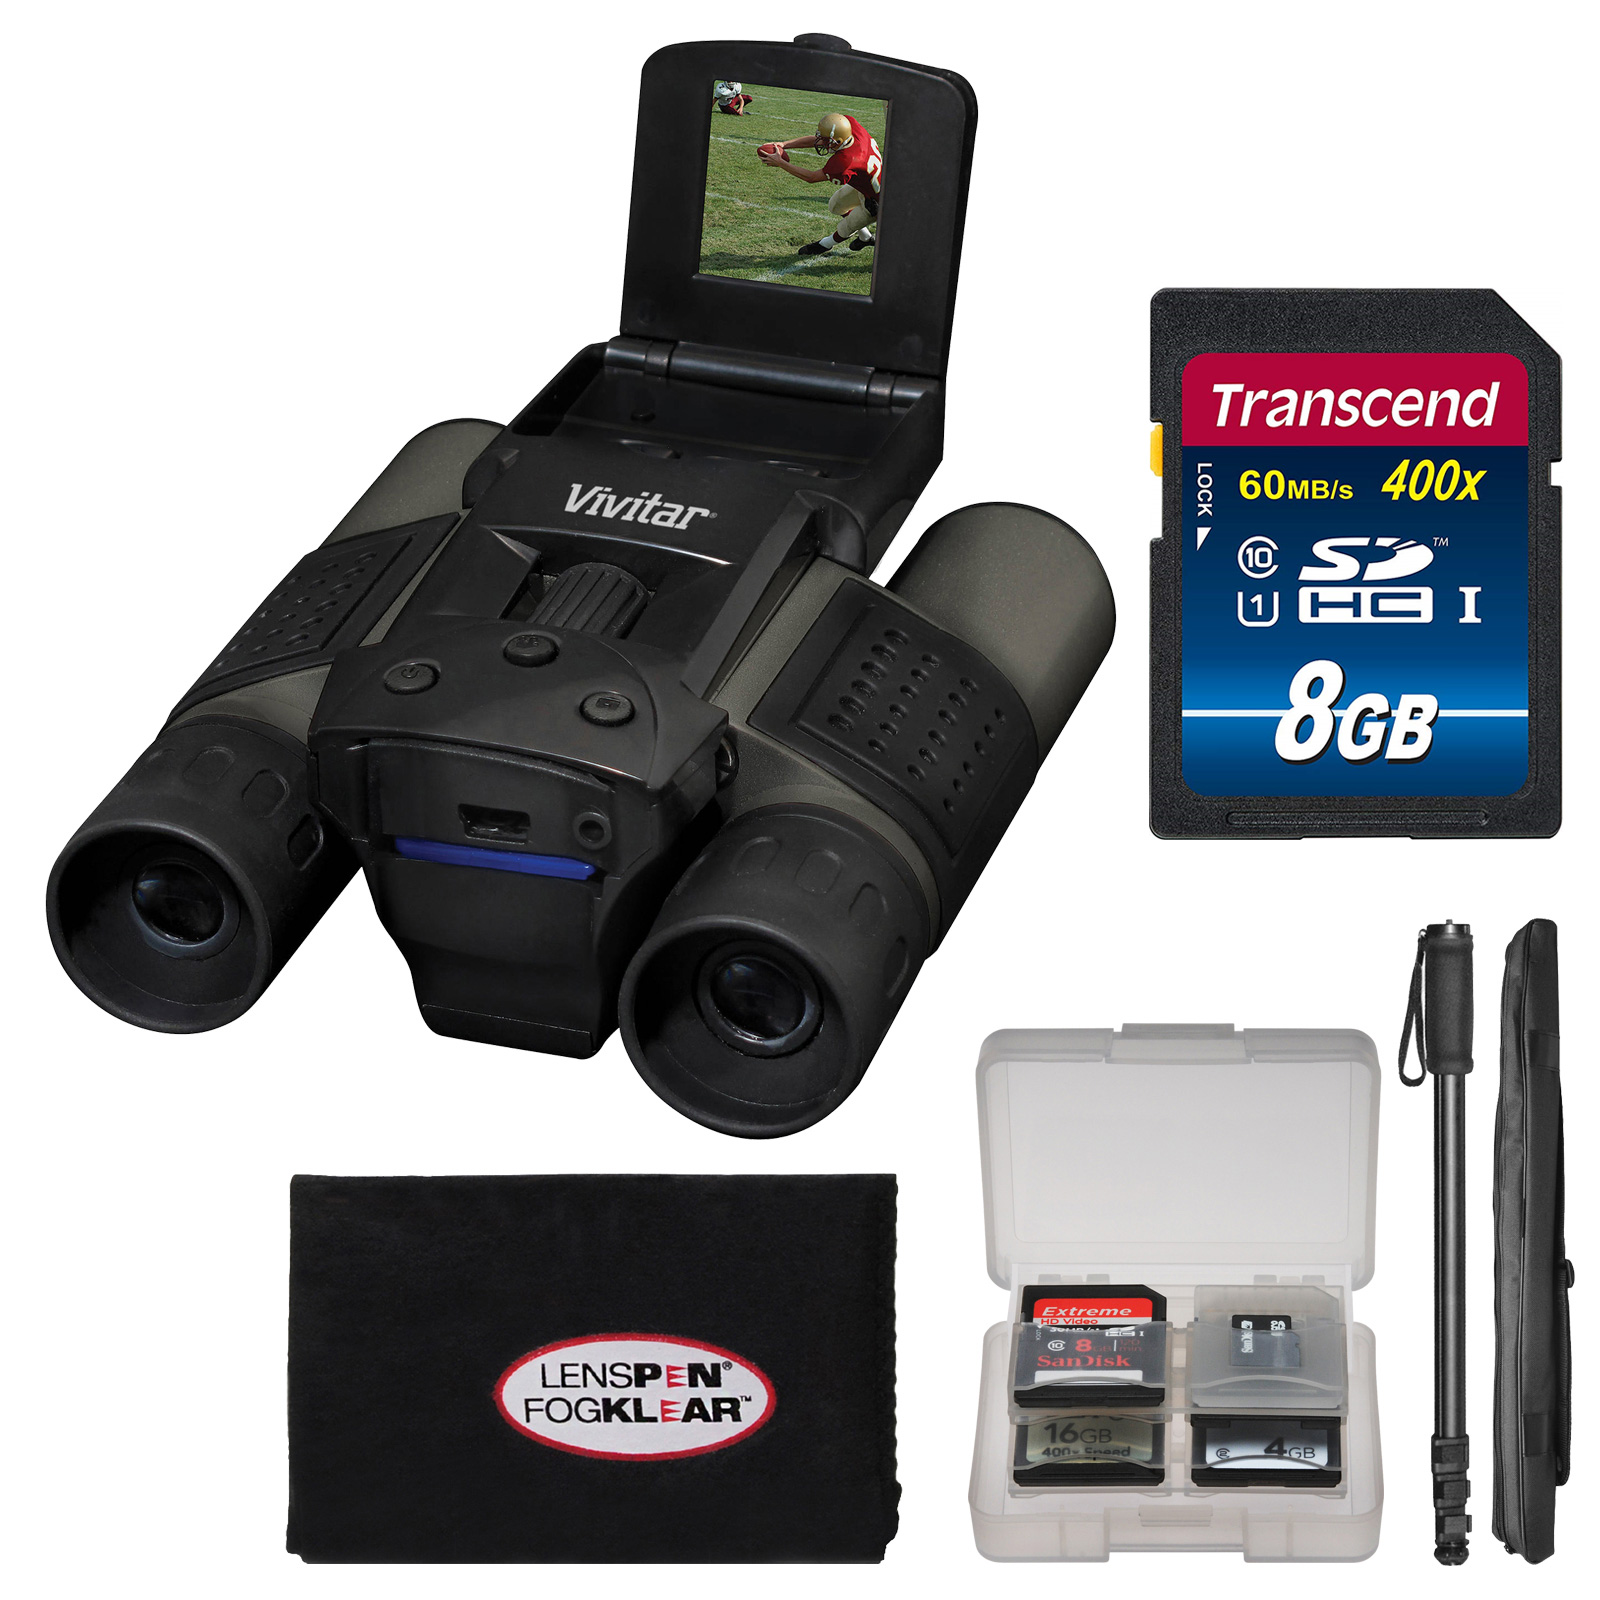 Vivitar 10x25 Binoculars with Built-in Digital Camera with 8GB Card + Monopod + FogKlear Cleaning Cloth + Kit by Vivitar